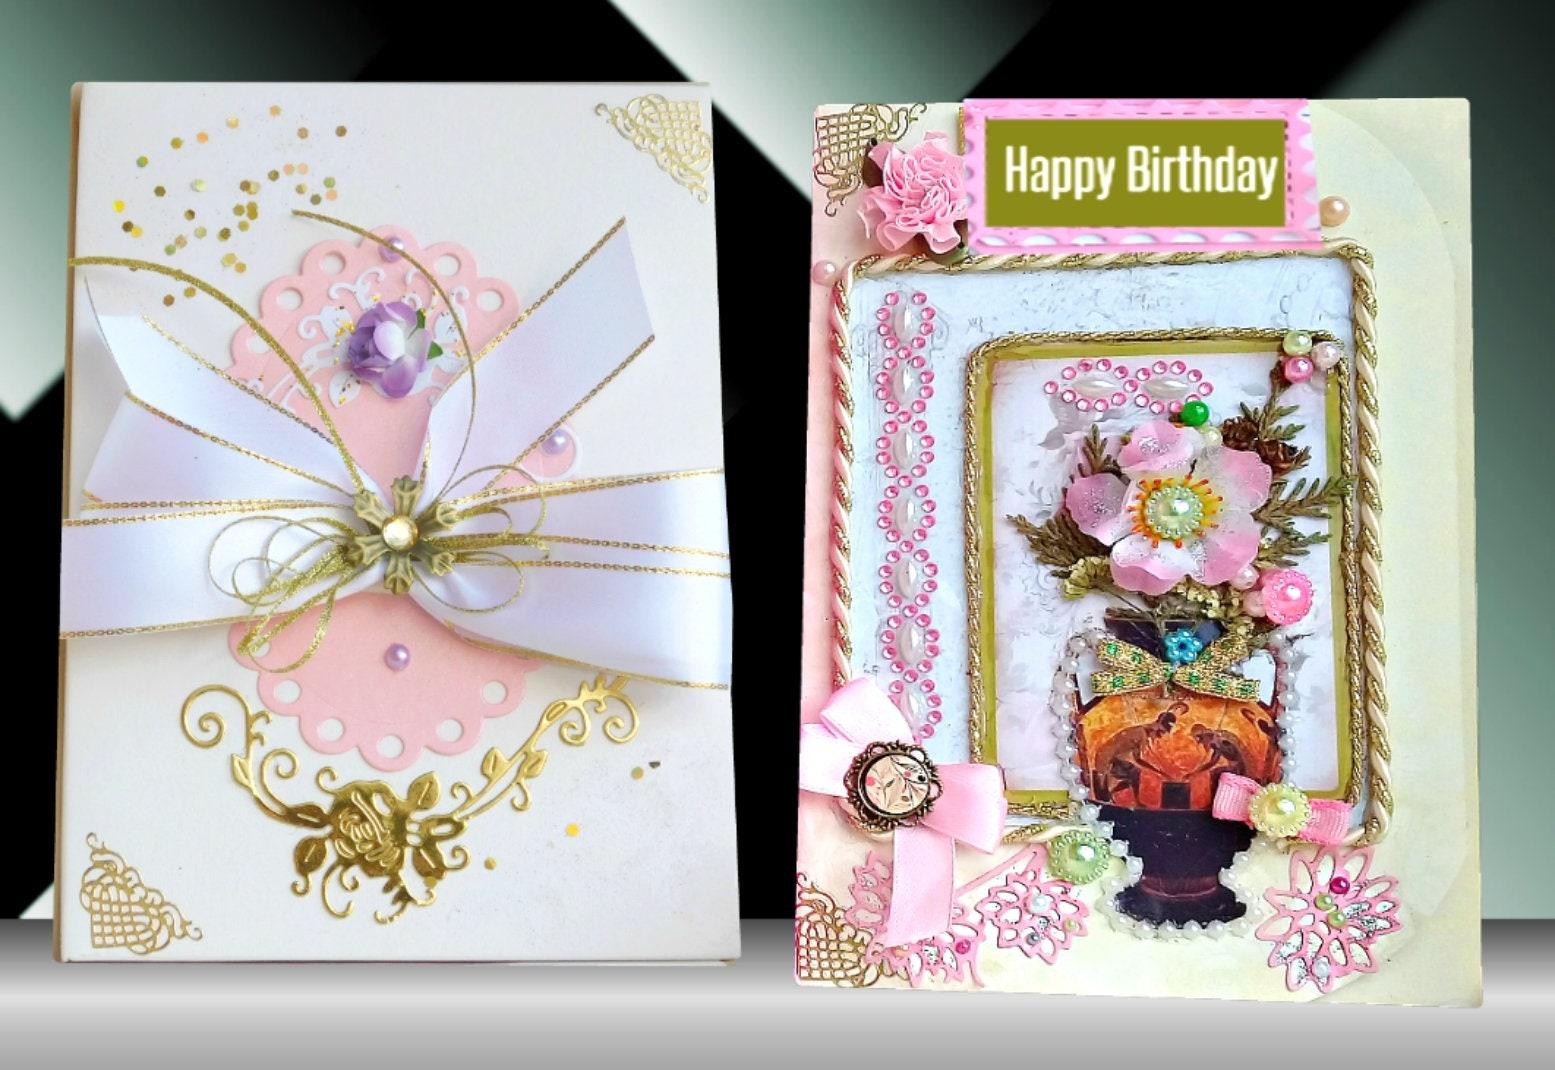 Friend Birthday Card For Mom Girlfriend Gift Fiance Romantic Best